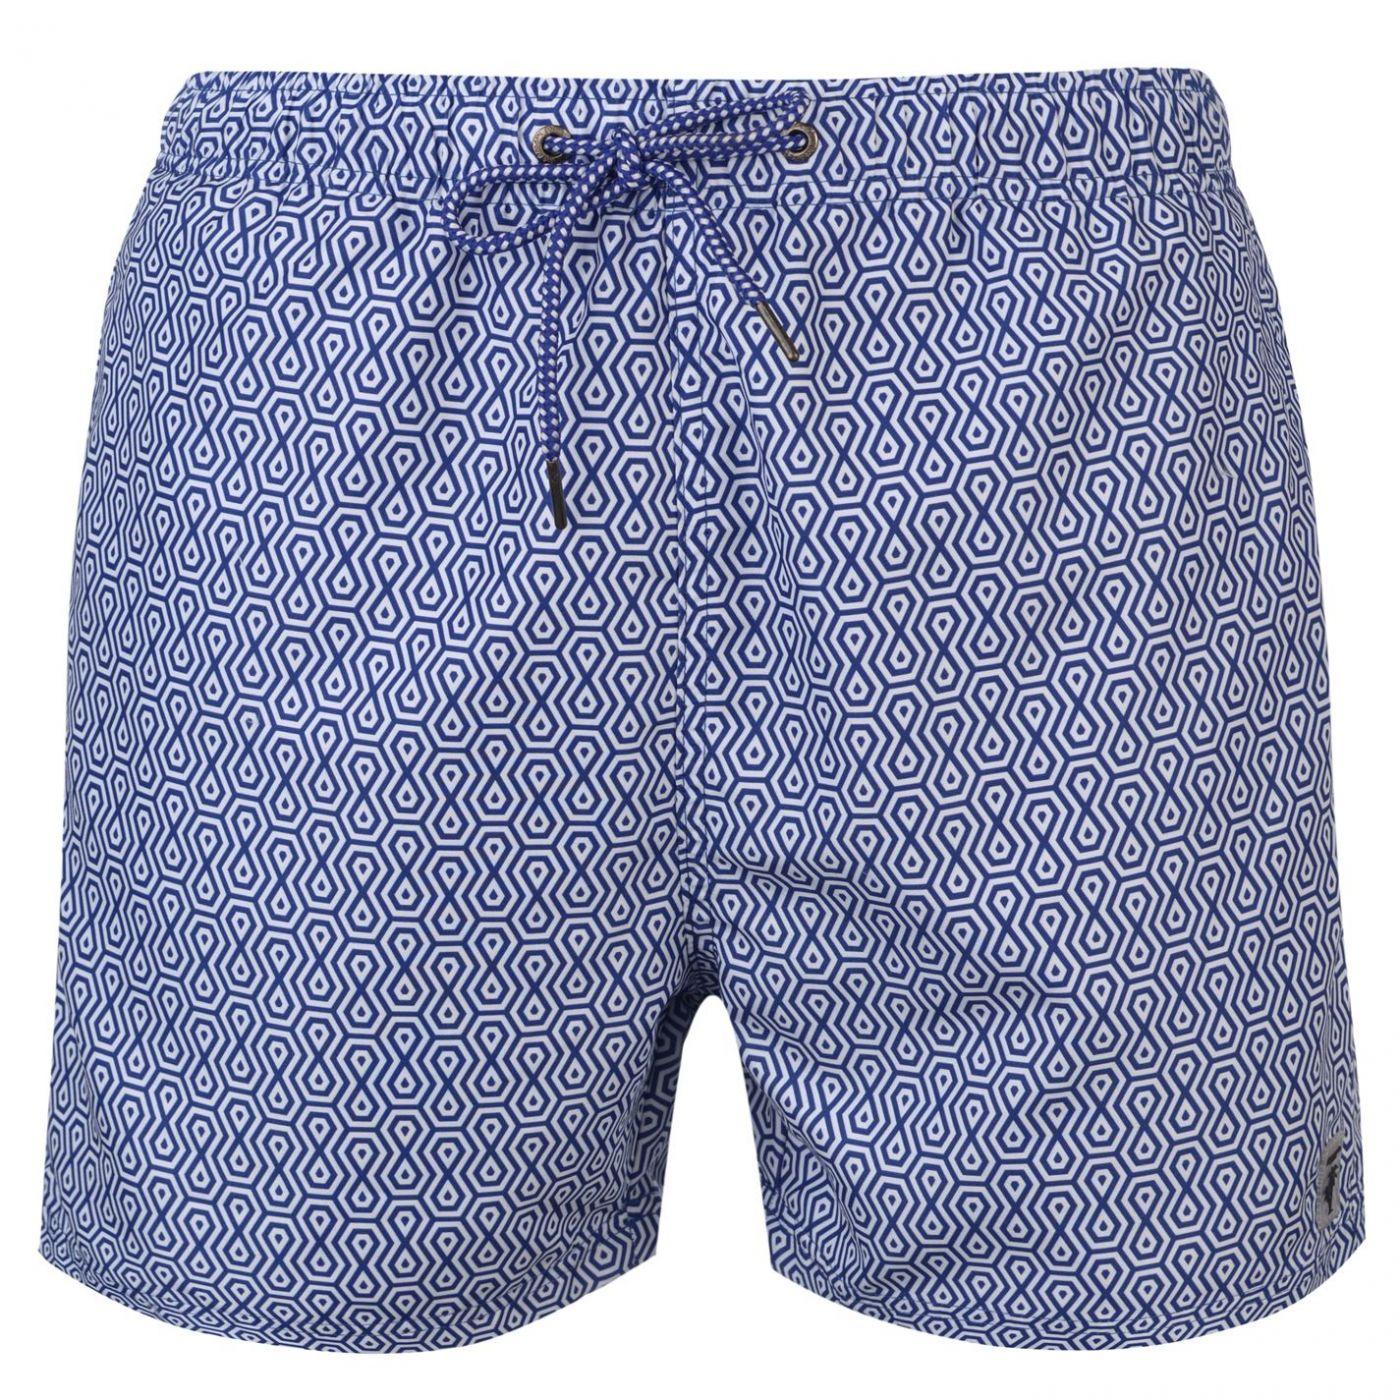 Pierre Cardin Geo Swim Shorts Mens